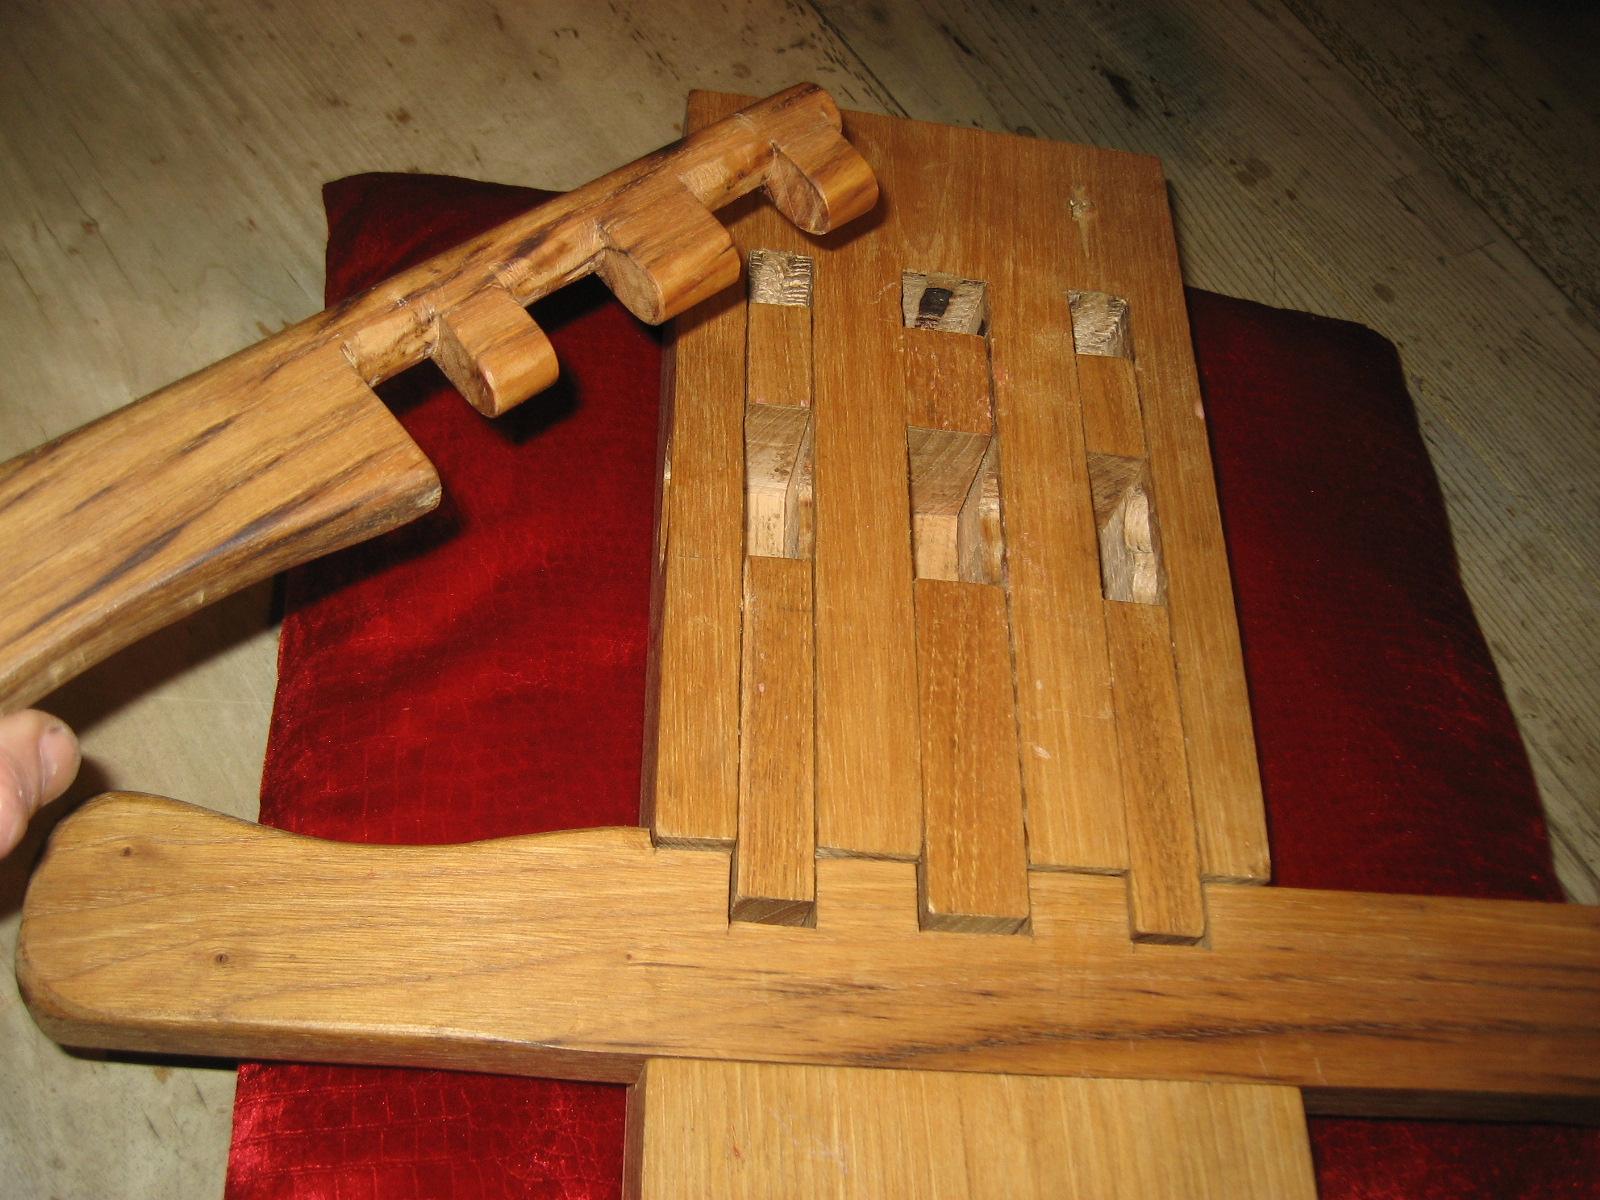 cerraduras antiguas de madera